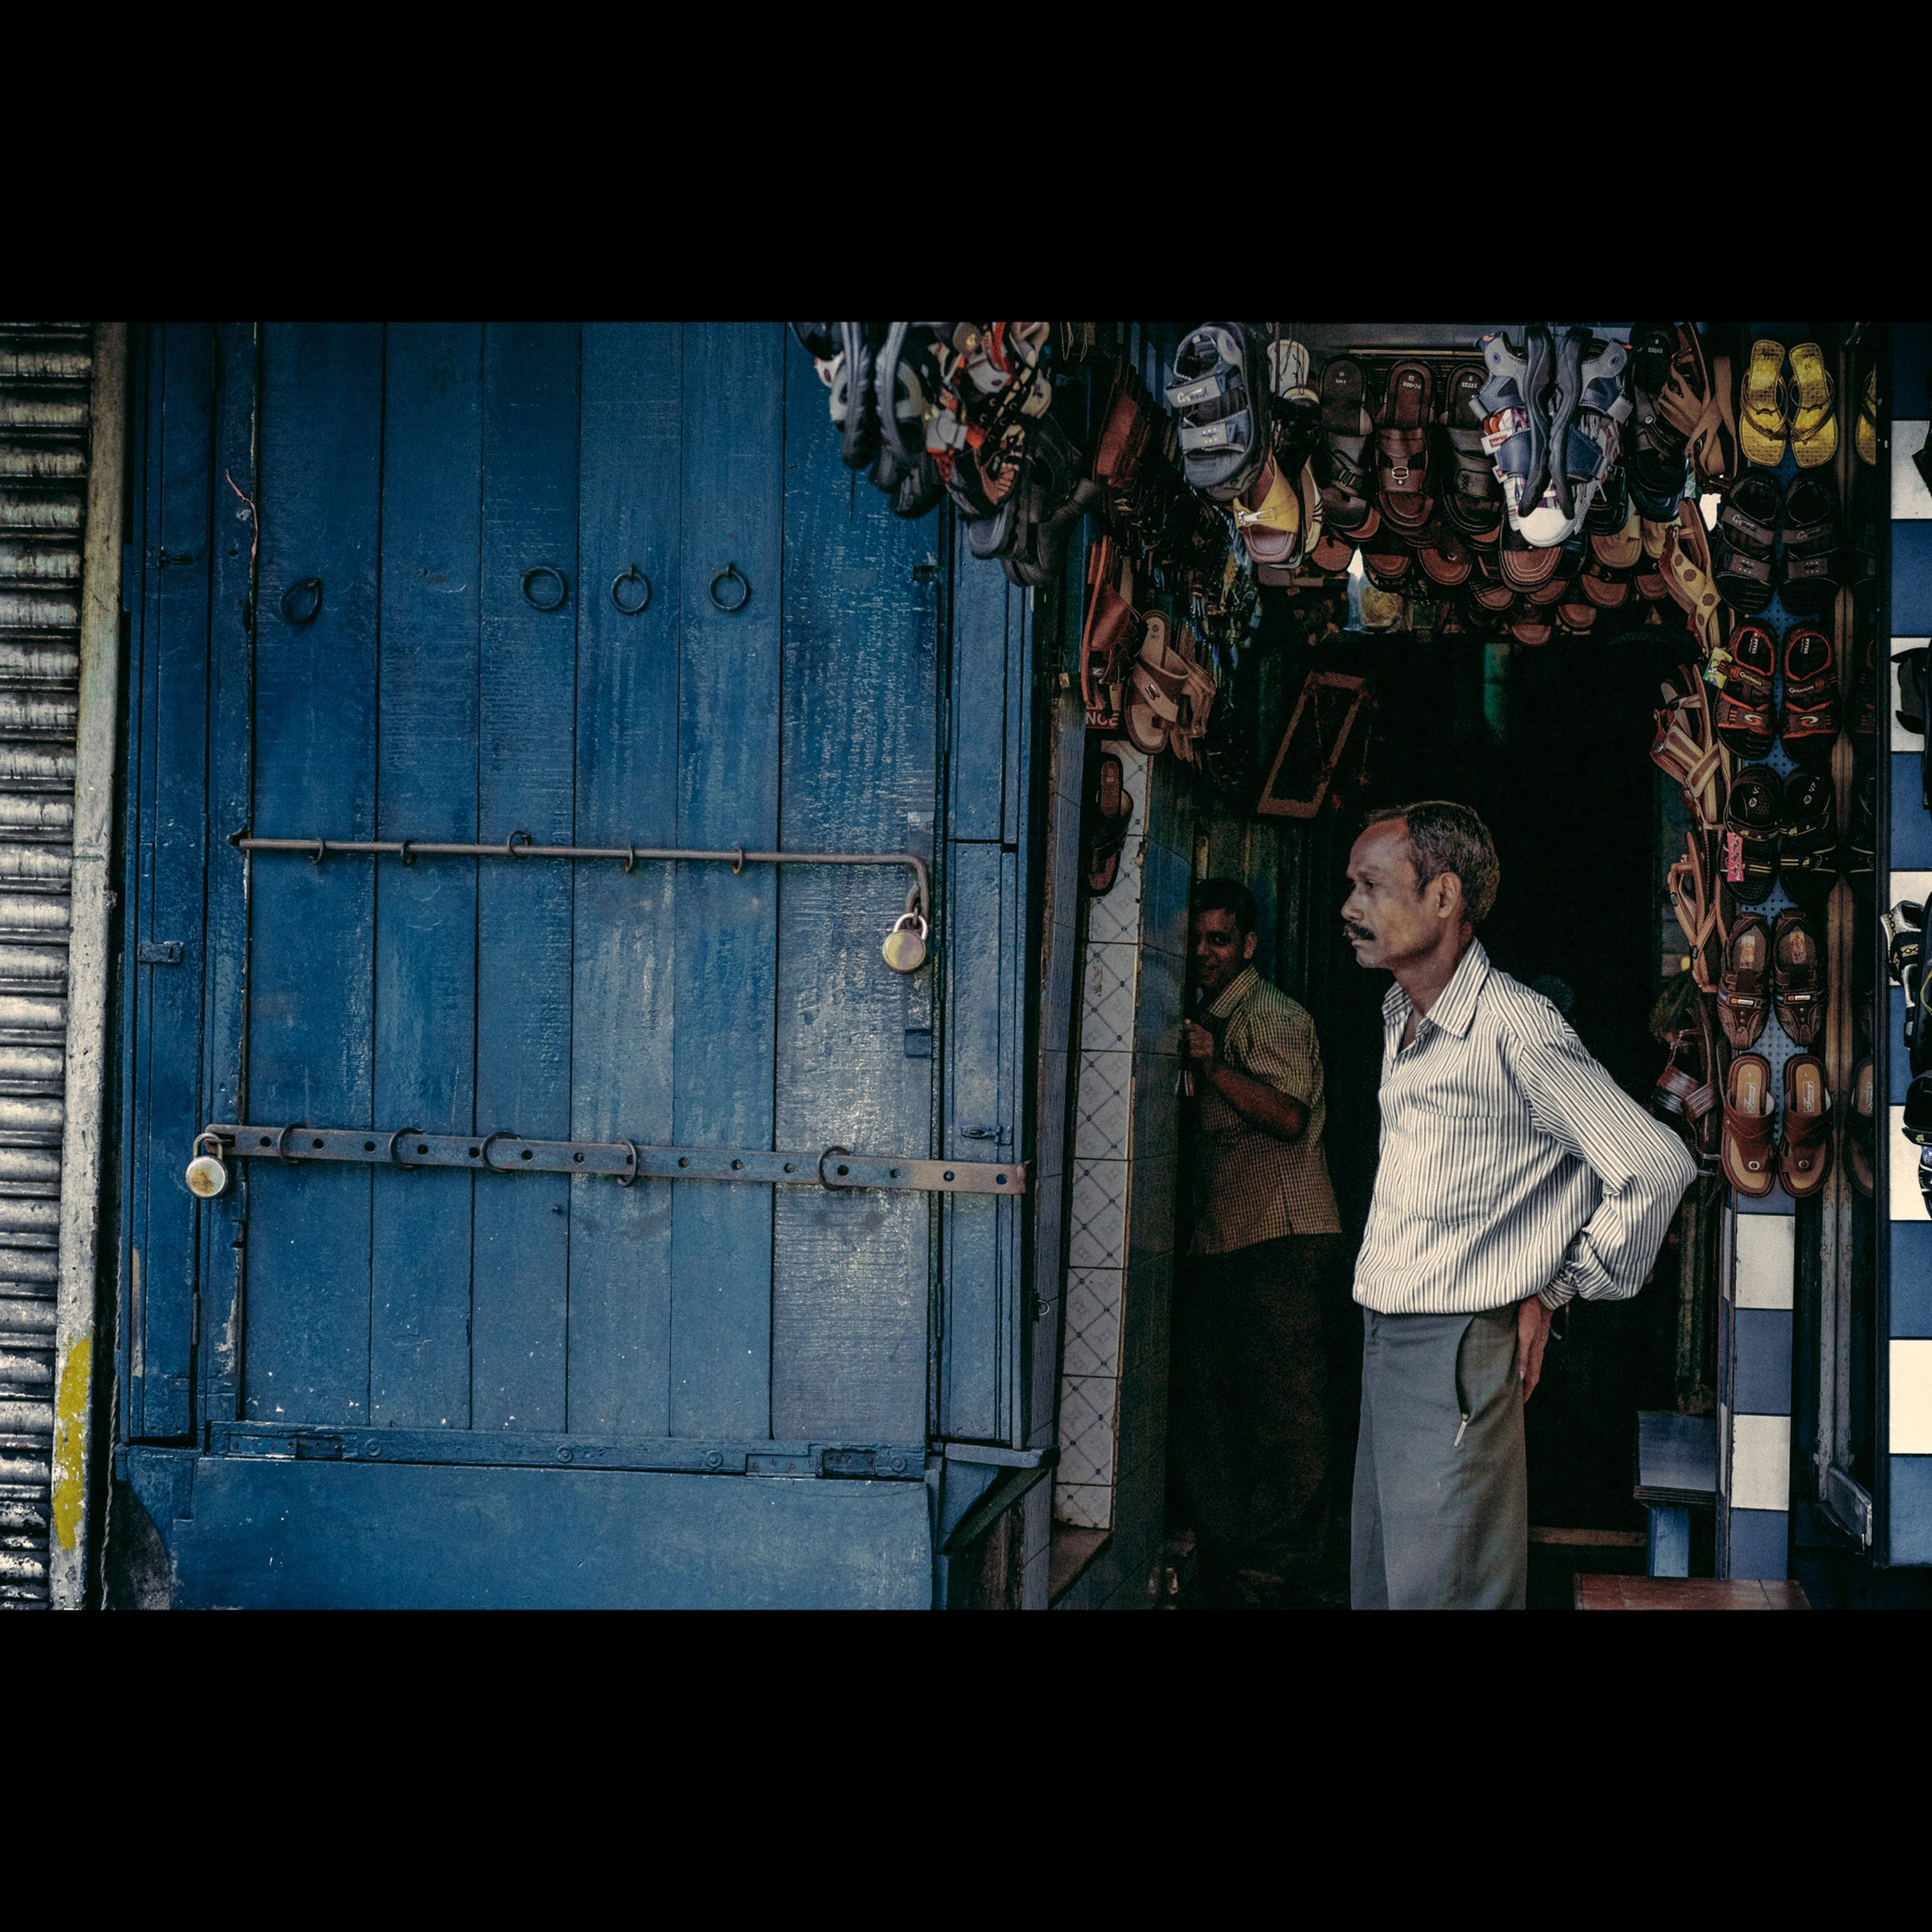 Streetphotography Shoemaker India Kolkata The Human Condition Man Streetvendor Portrait Blue Avigram First Eyeem Photo